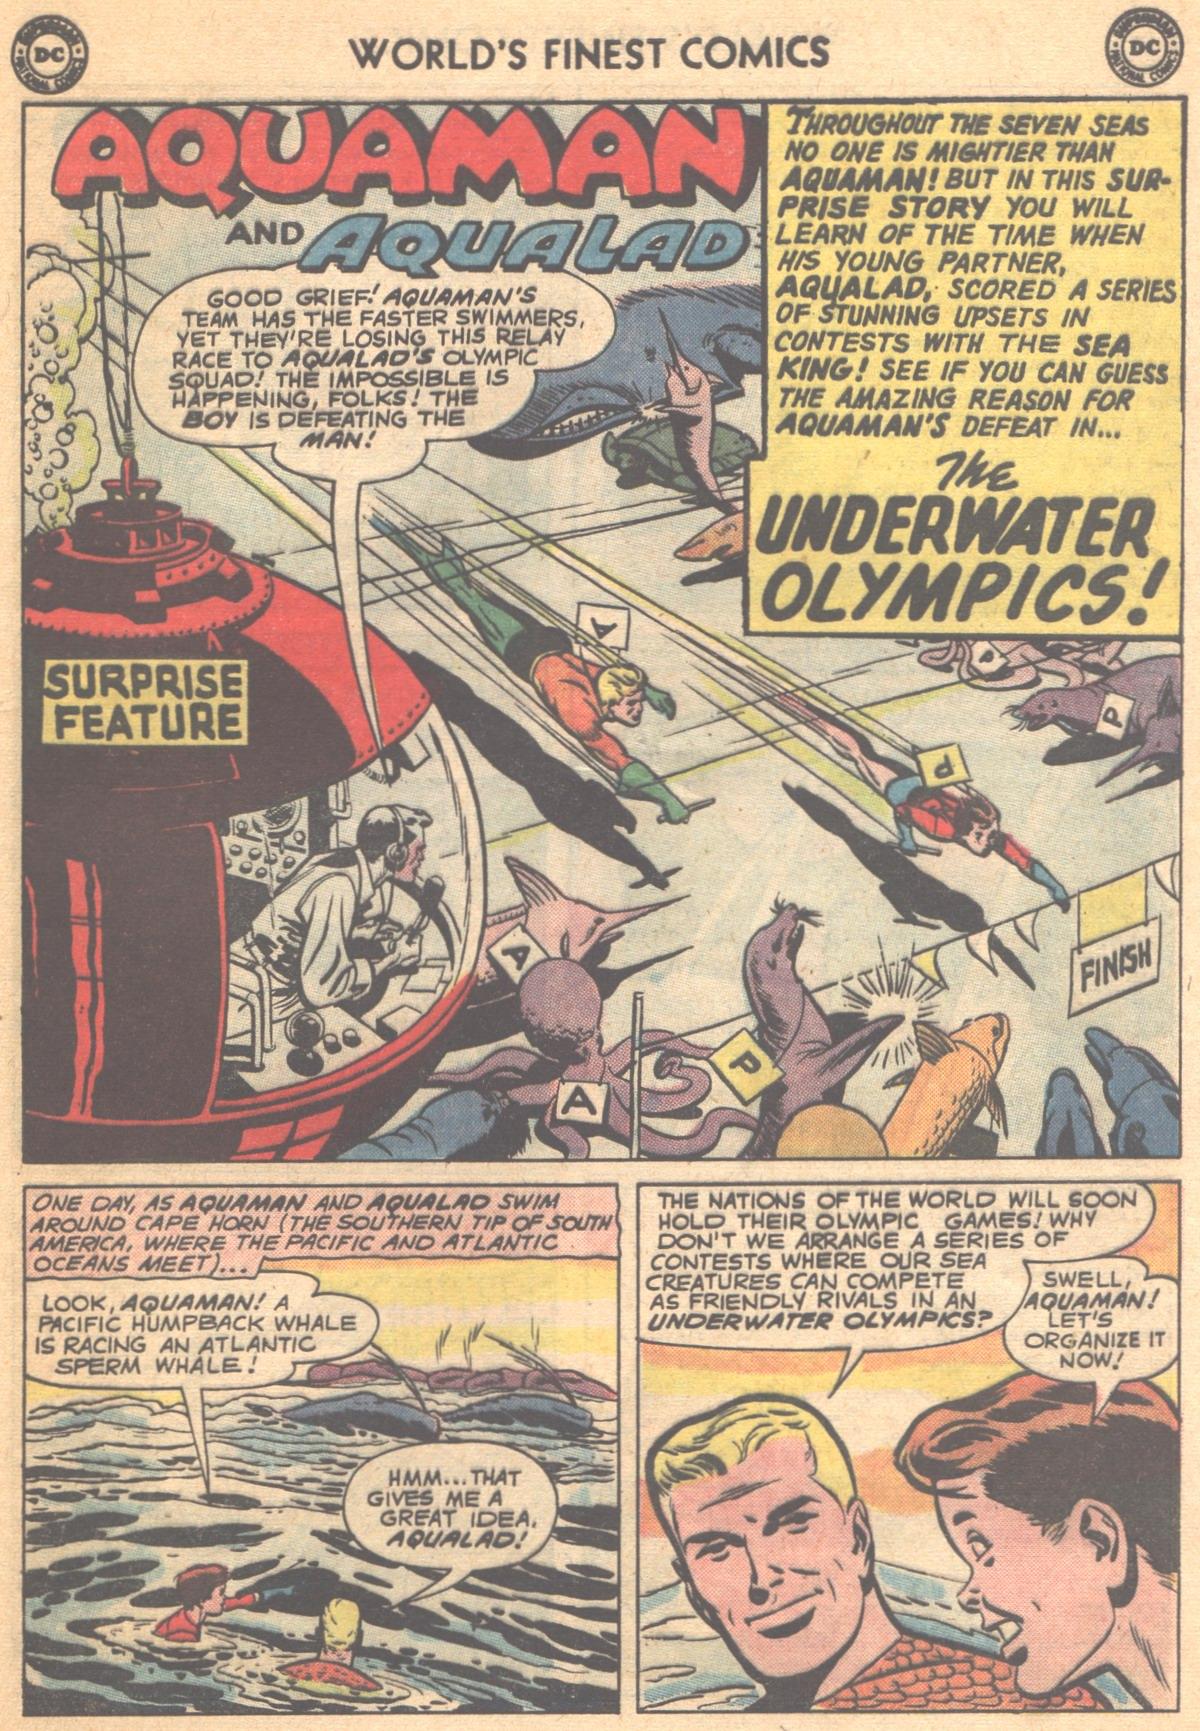 Read online World's Finest Comics comic -  Issue #147 - 25